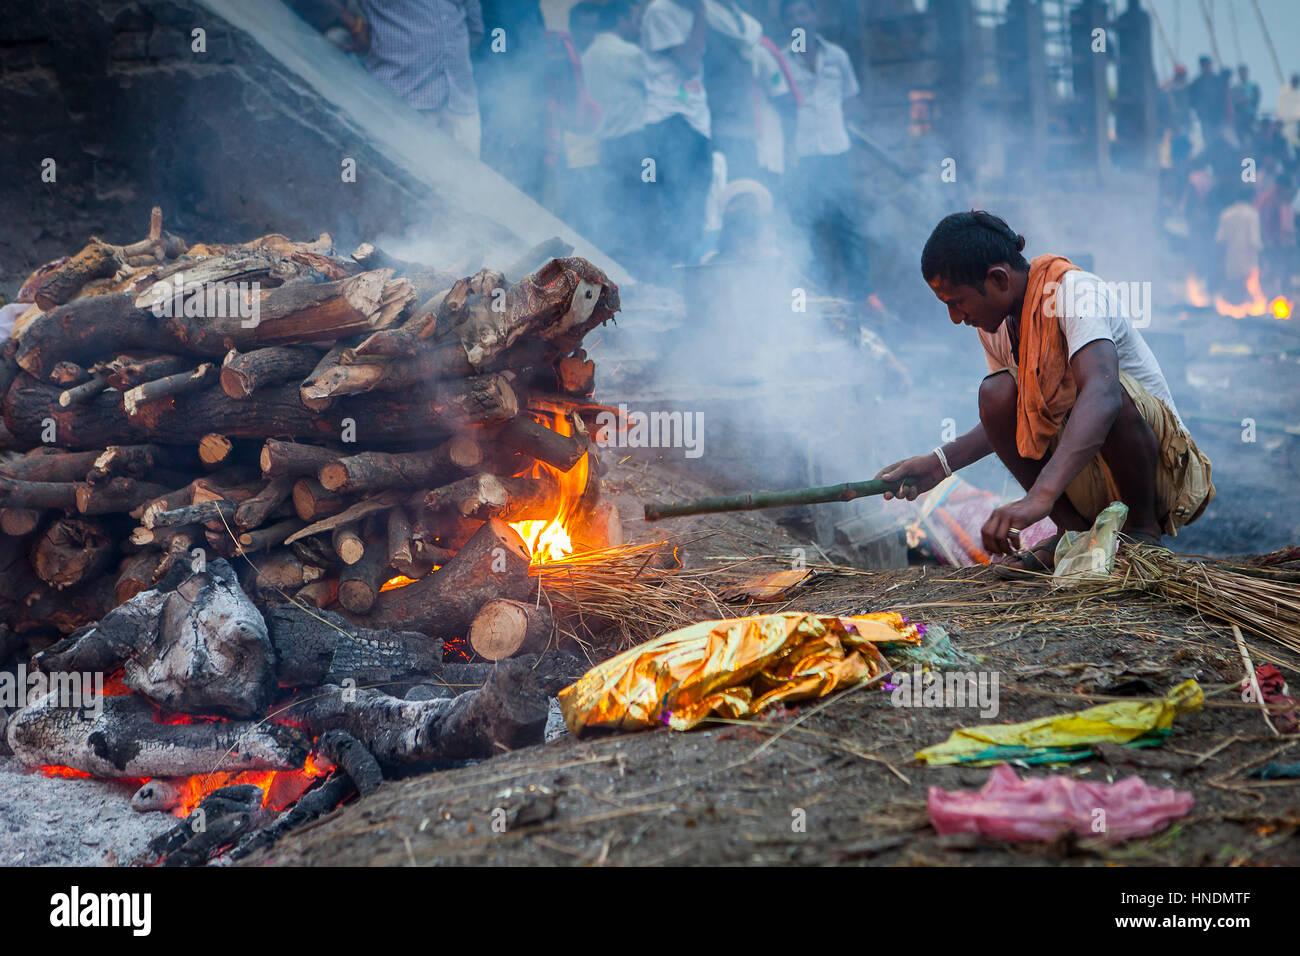 Cremation of a body, in Manikarnika Ghat, the burning ghat, on the banks of Ganges river, Varanasi, Uttar Pradesh, - Stock Image